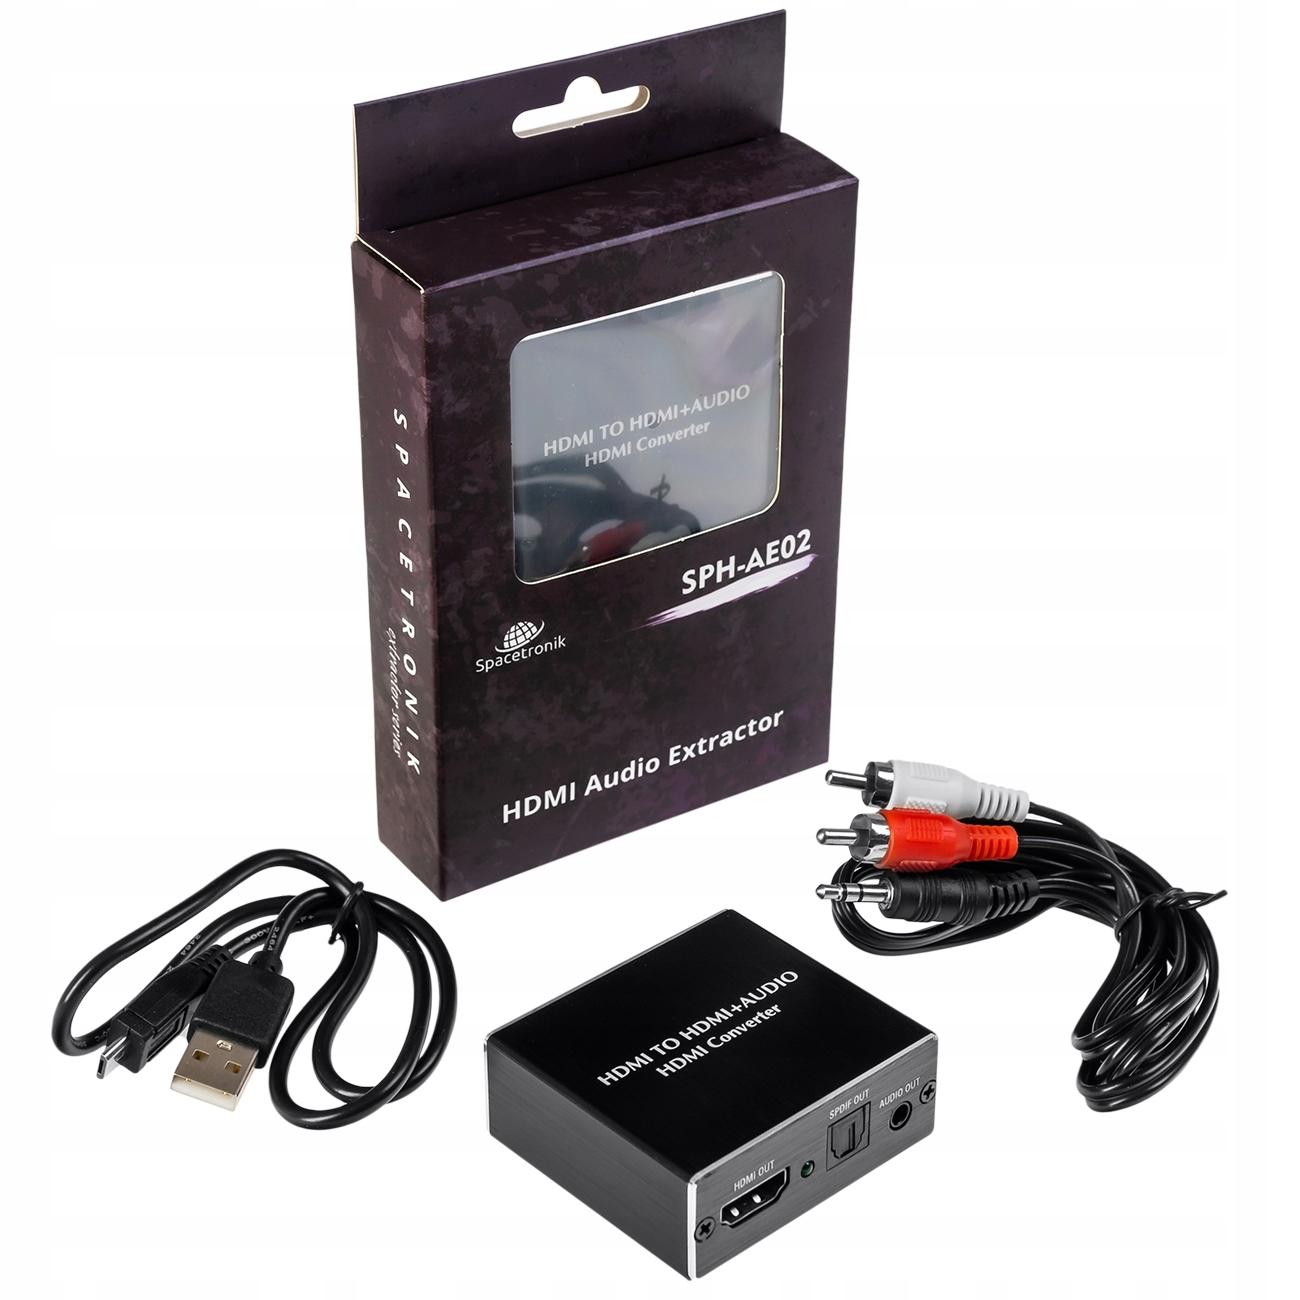 Extractor HDMI + Audio SPDiF / Jack 3,5mm SPH-AE02 Kod producenta Extractor HDMI + Audio SPDiF / Jack 3,5mm SPH-AE02